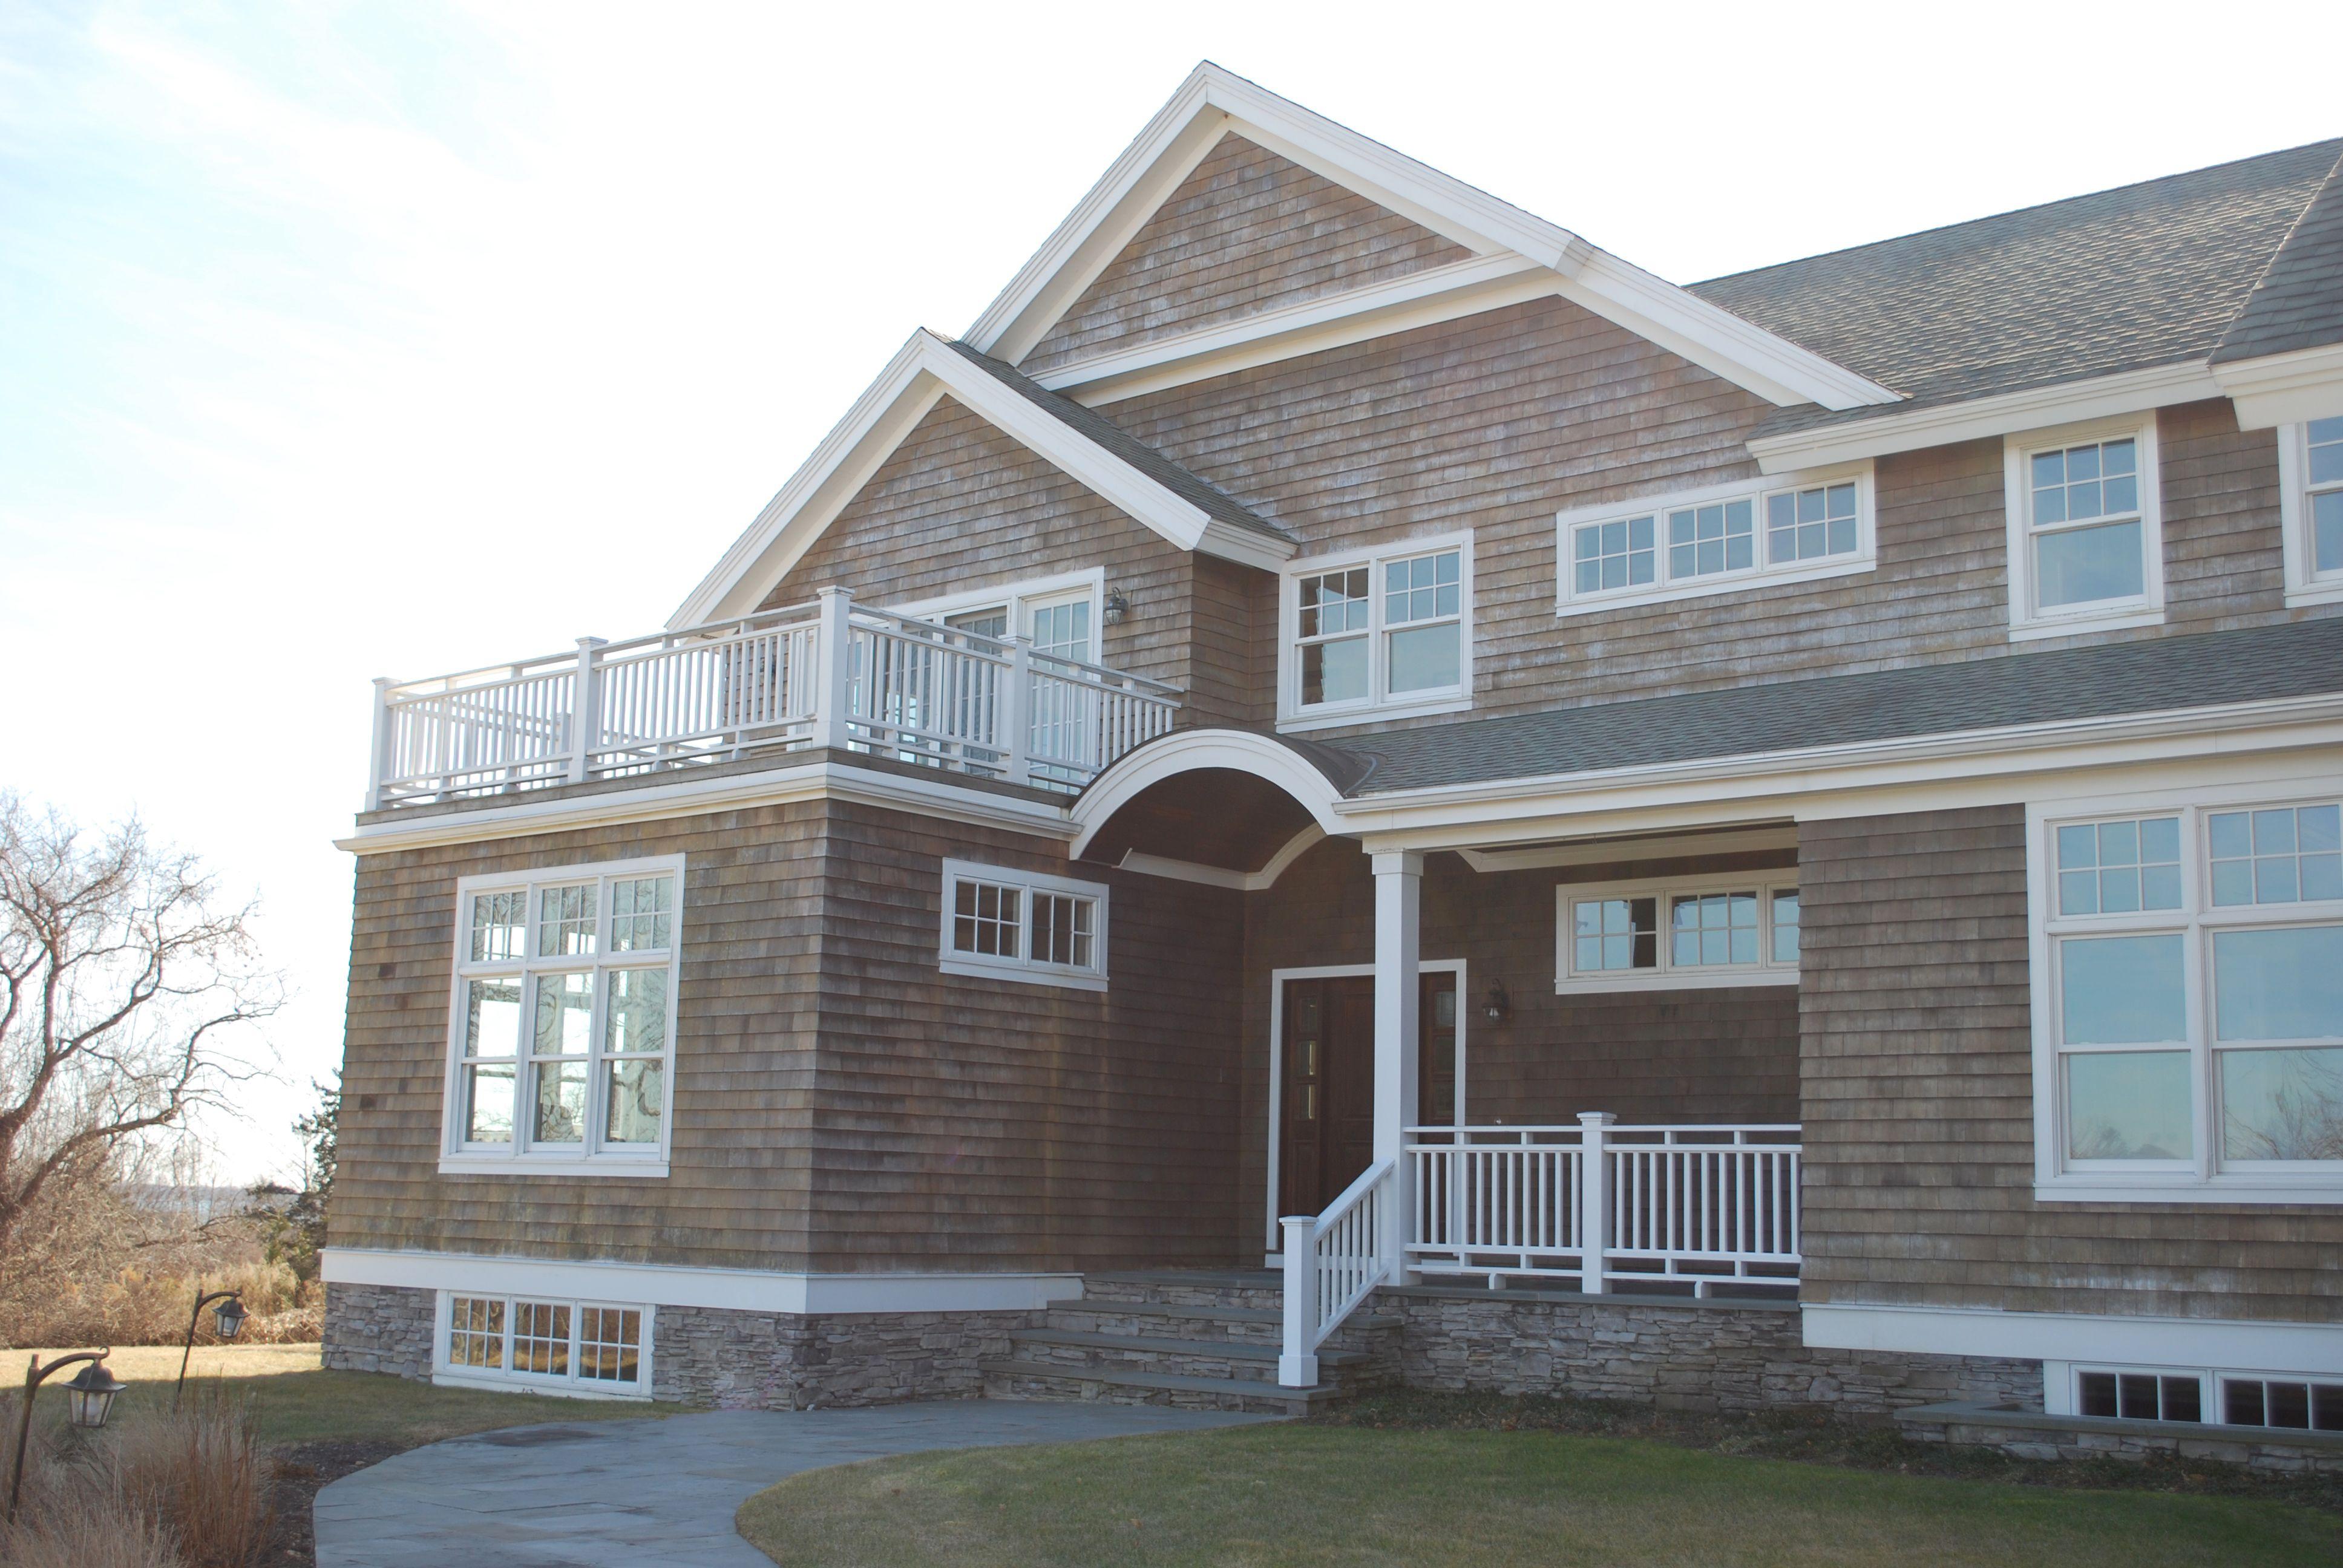 Shingle style waterfront home plans for Progressive farmer house plans